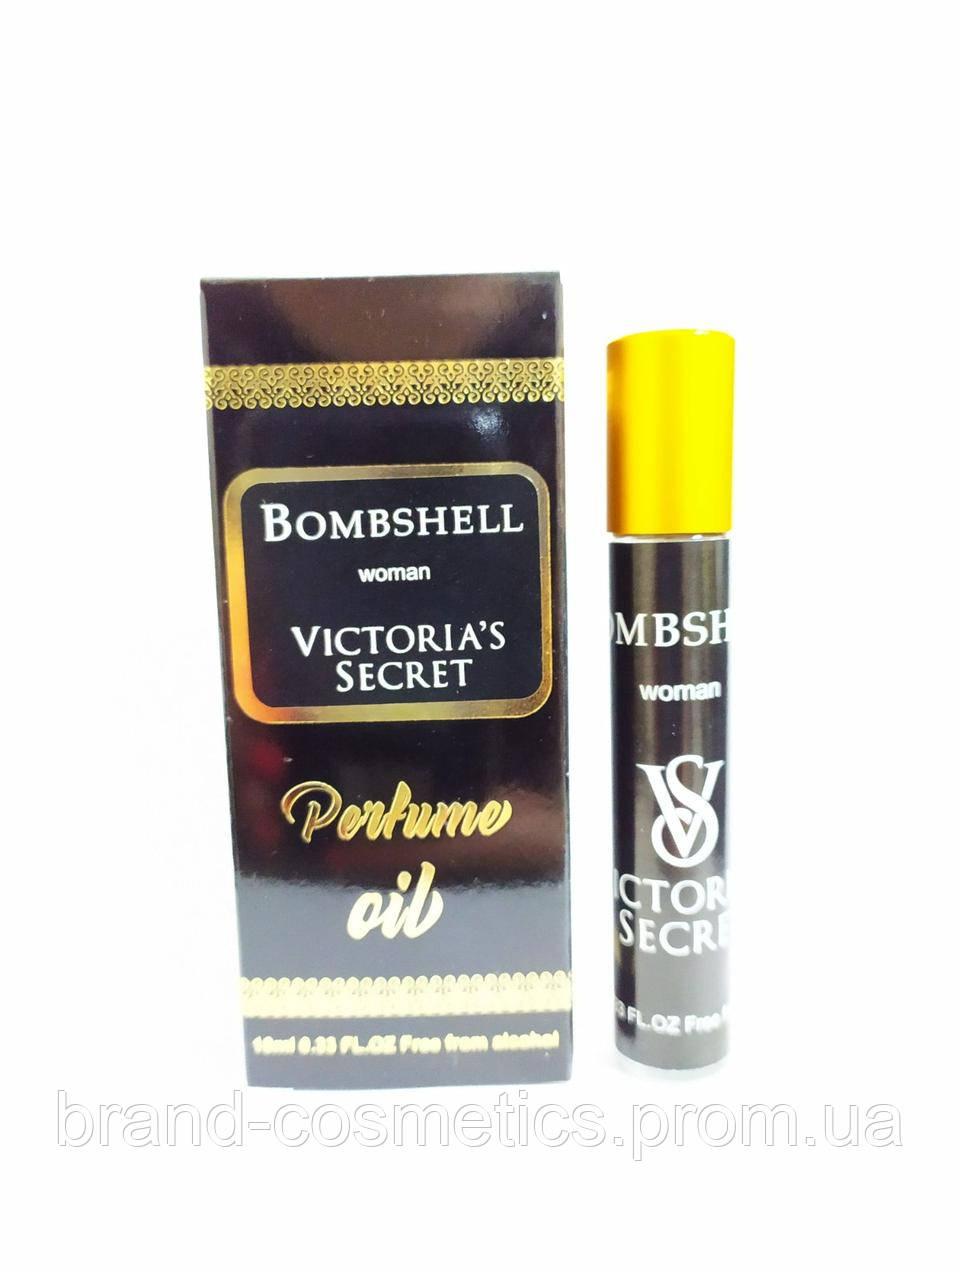 Масляные духи Victoria's Secret Bombshell, женские